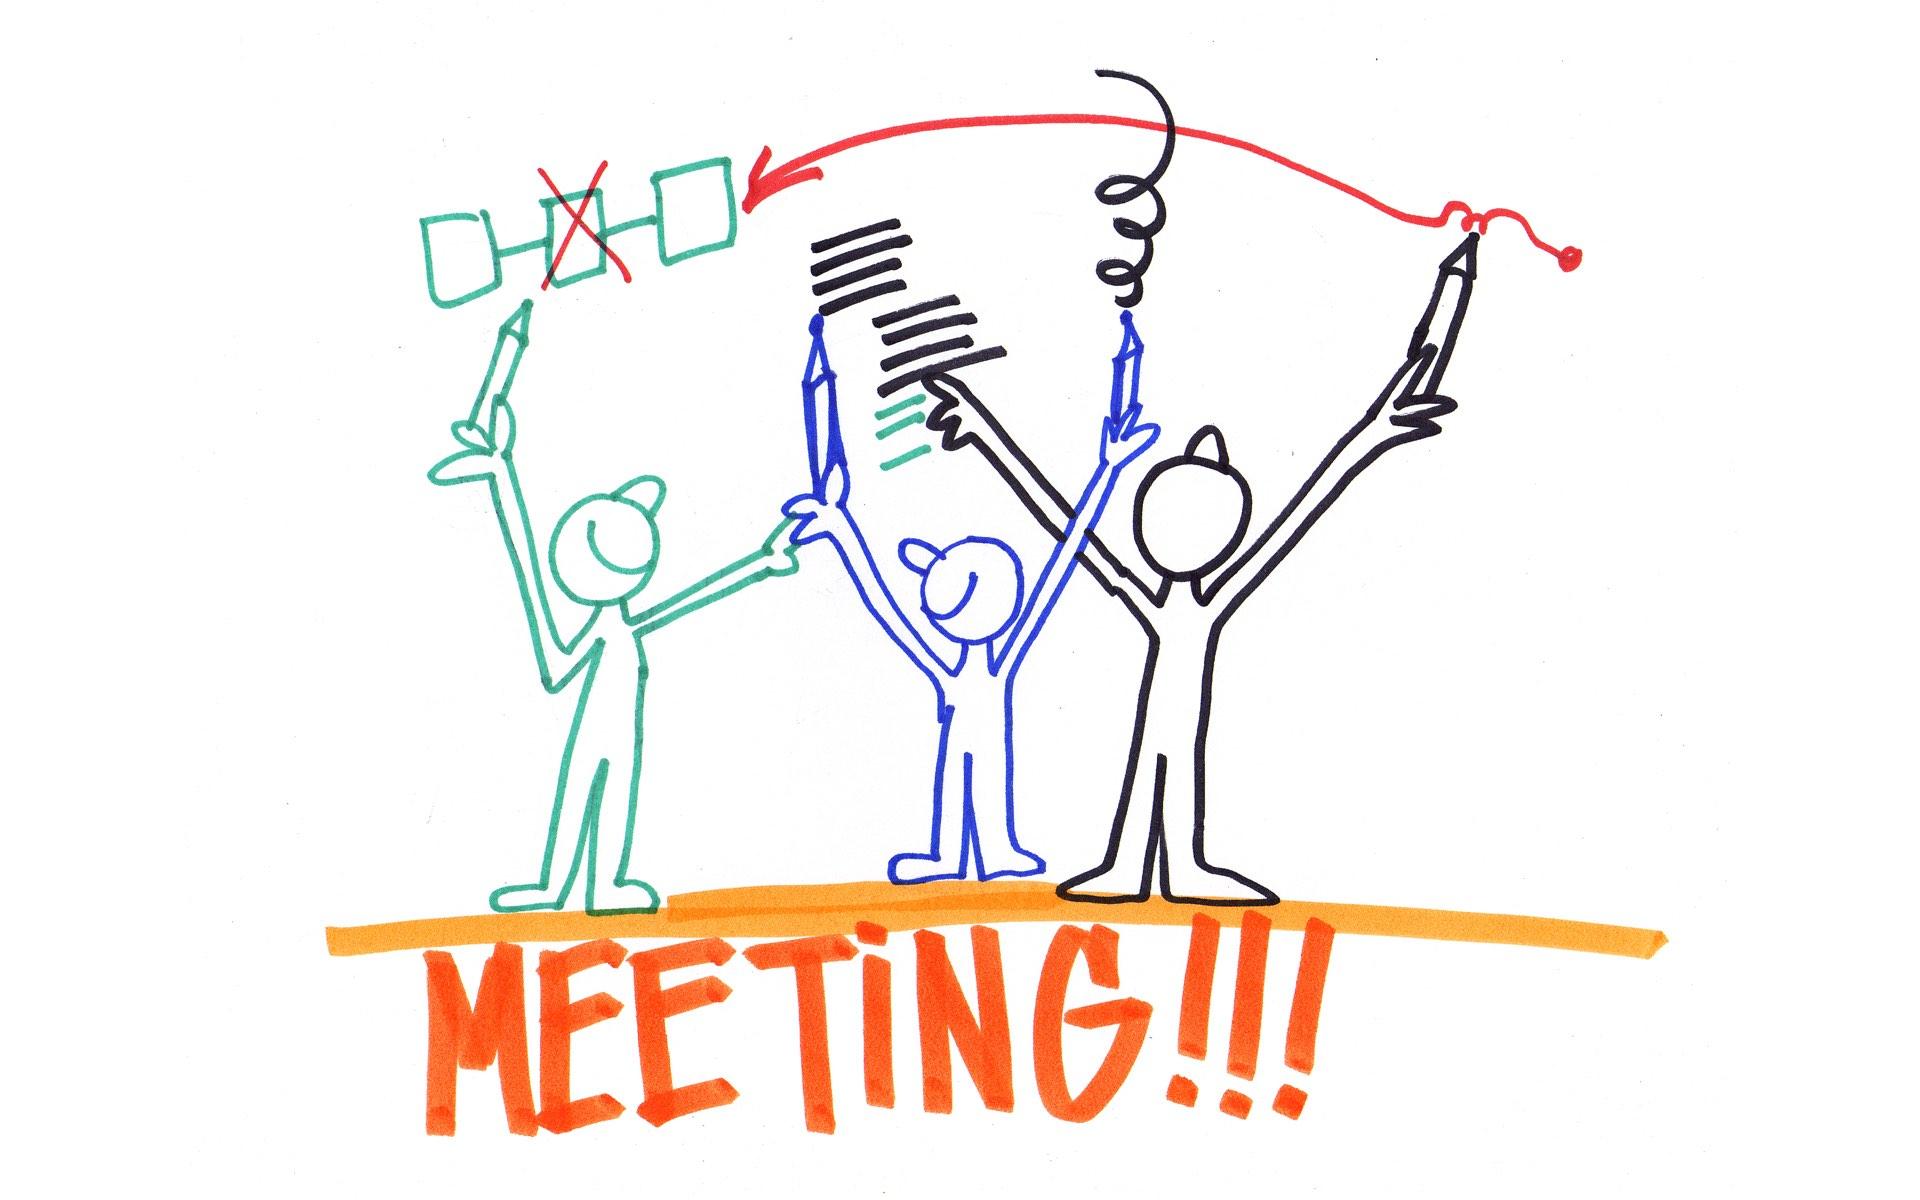 reuniones efectivas_1920x1200